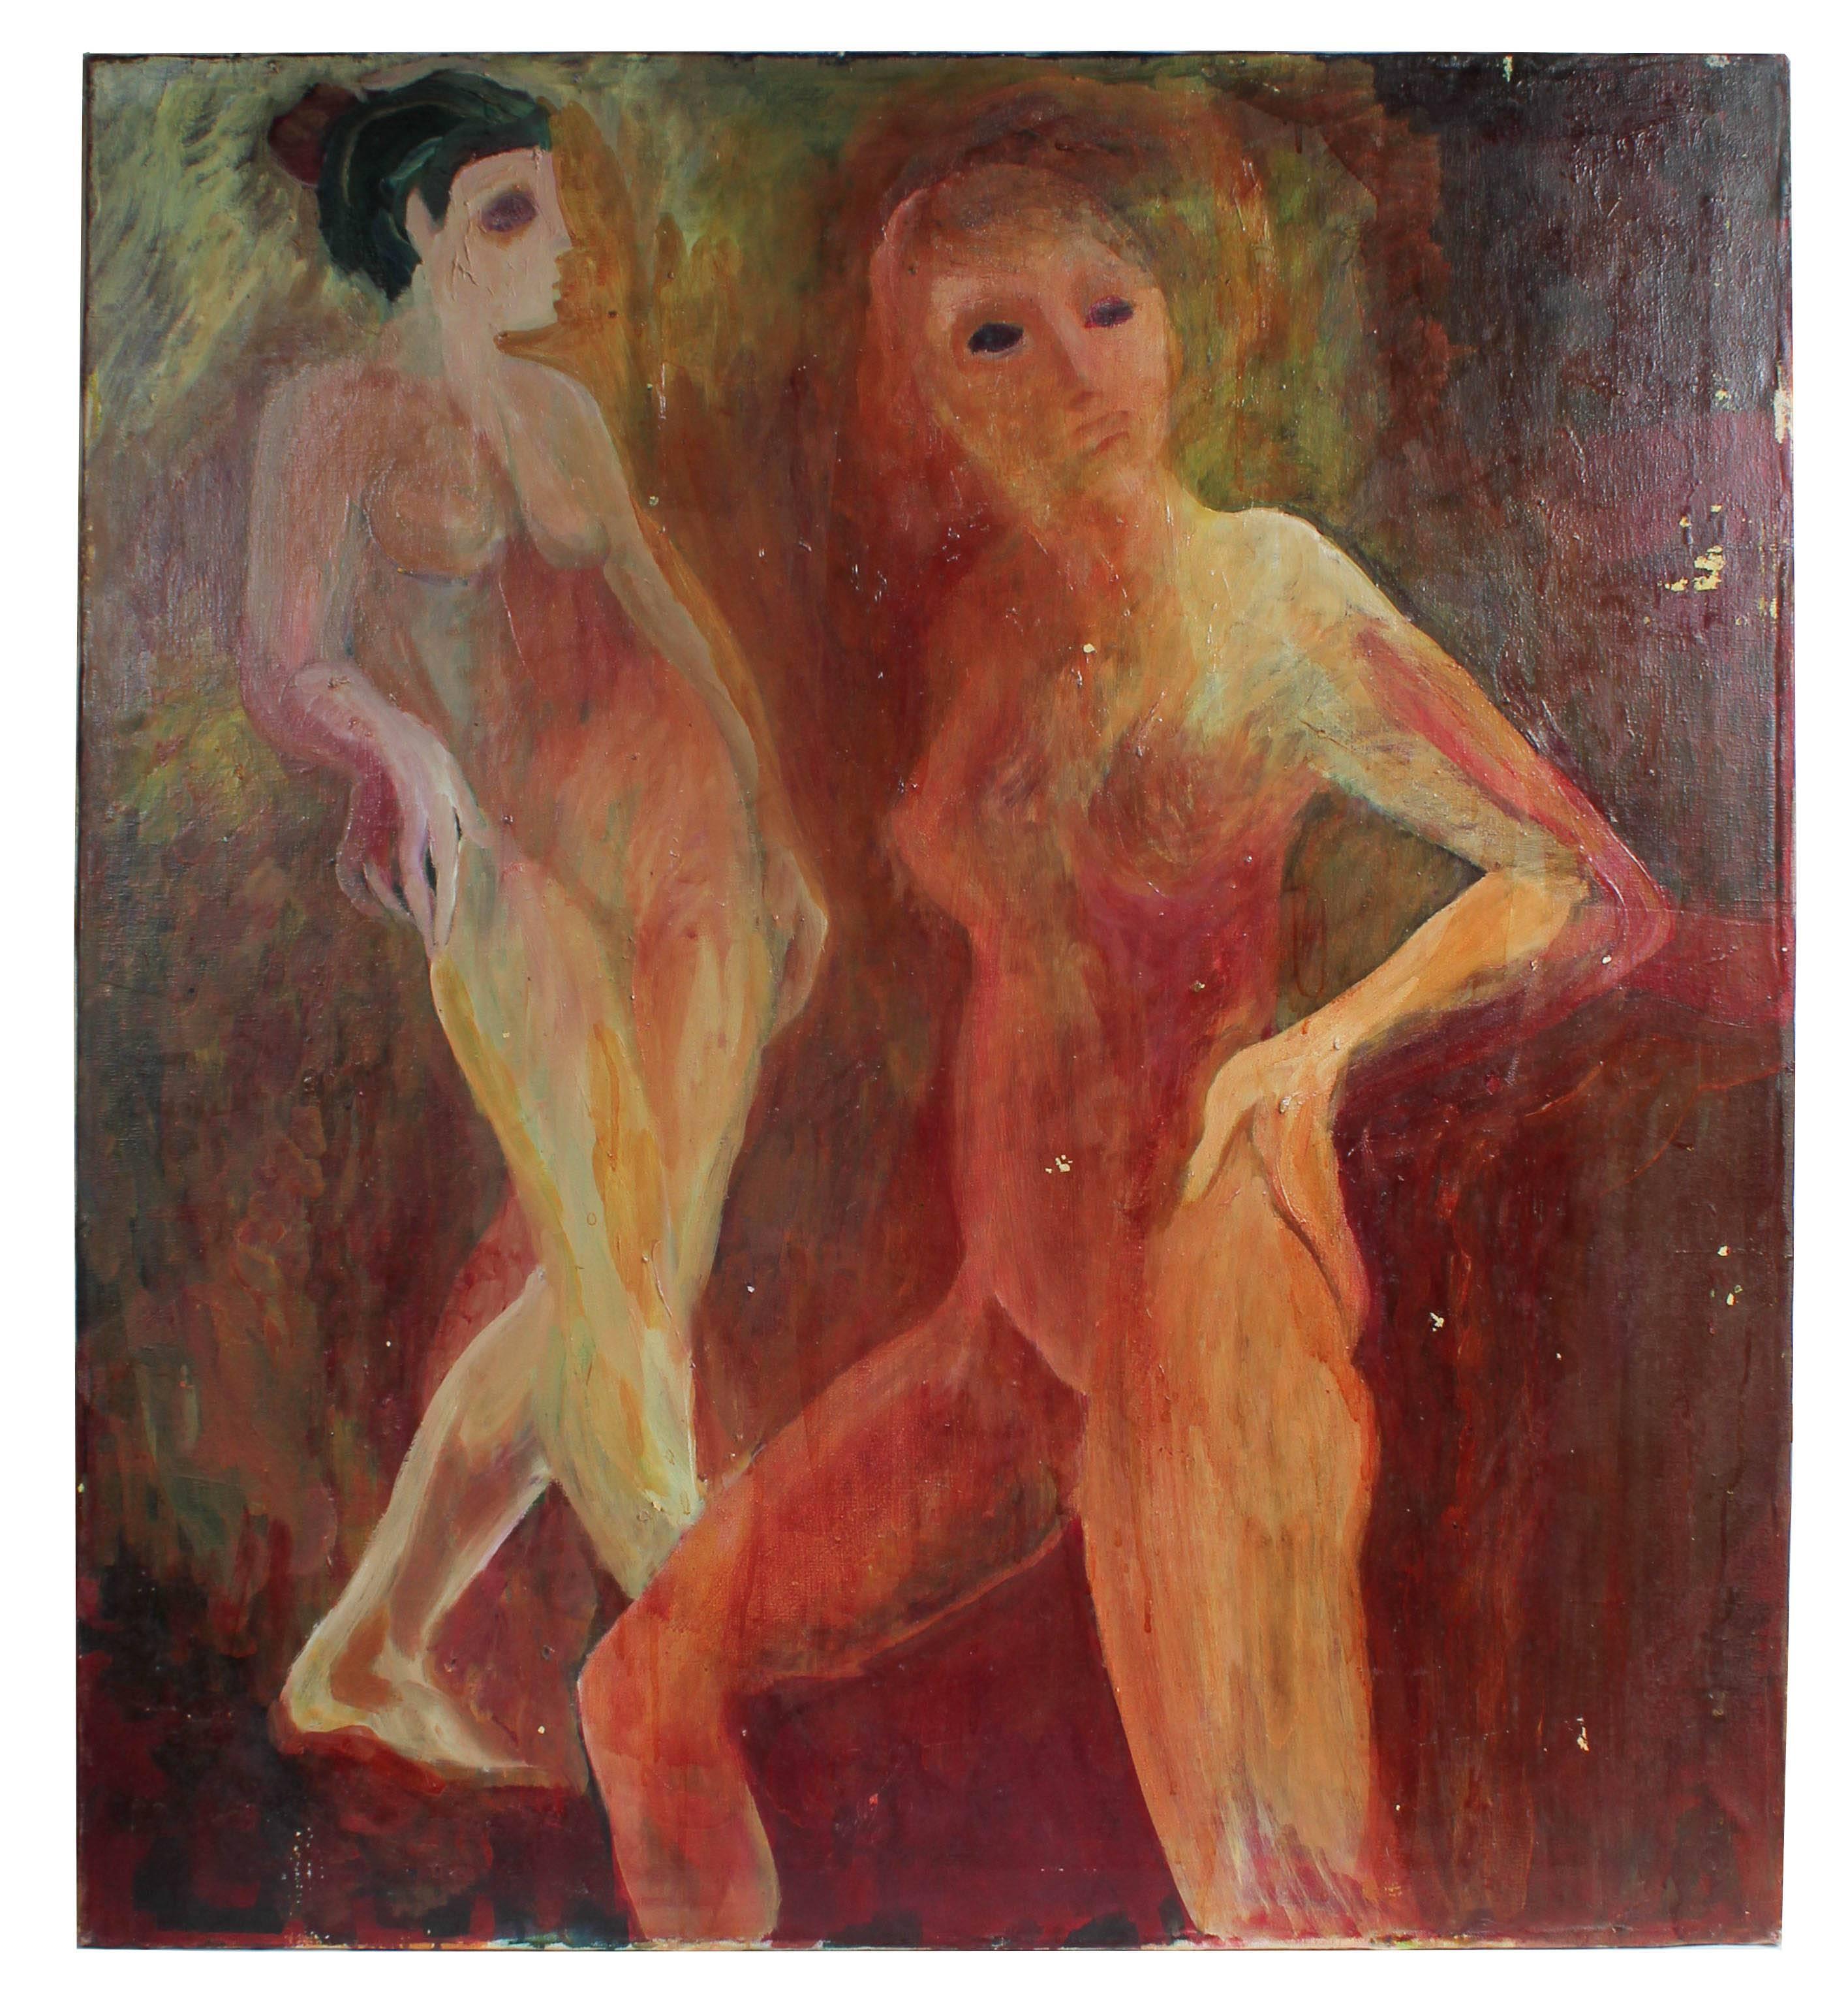 Modernist Nude Figures, Oil on Canvas, Circa 1977